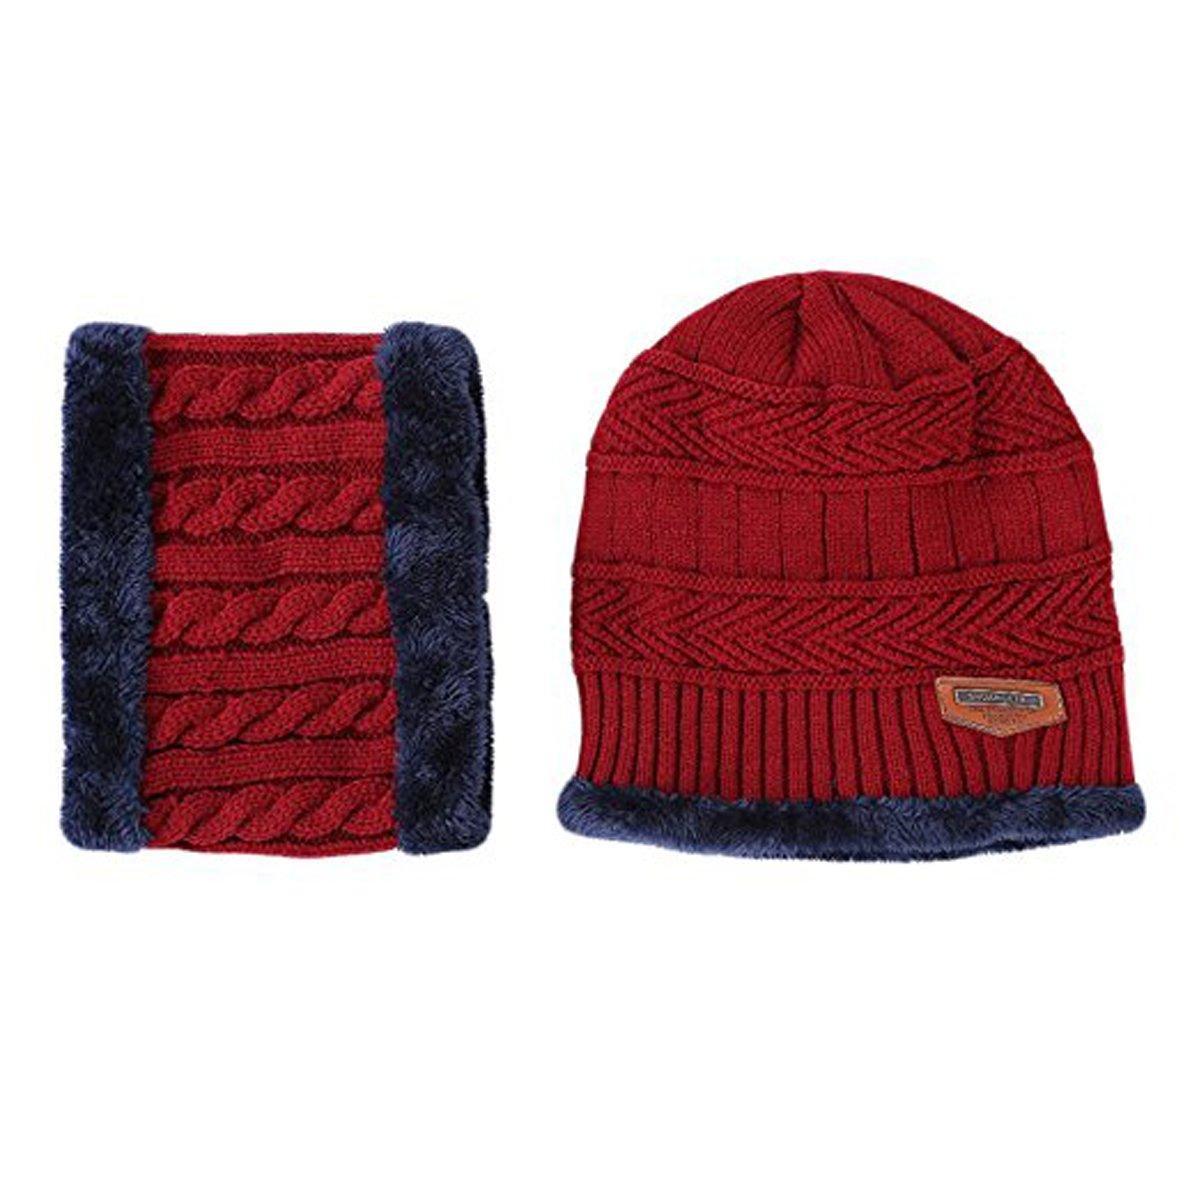 LSCY - Ensemble bonnet, écharpe et gants - Homme